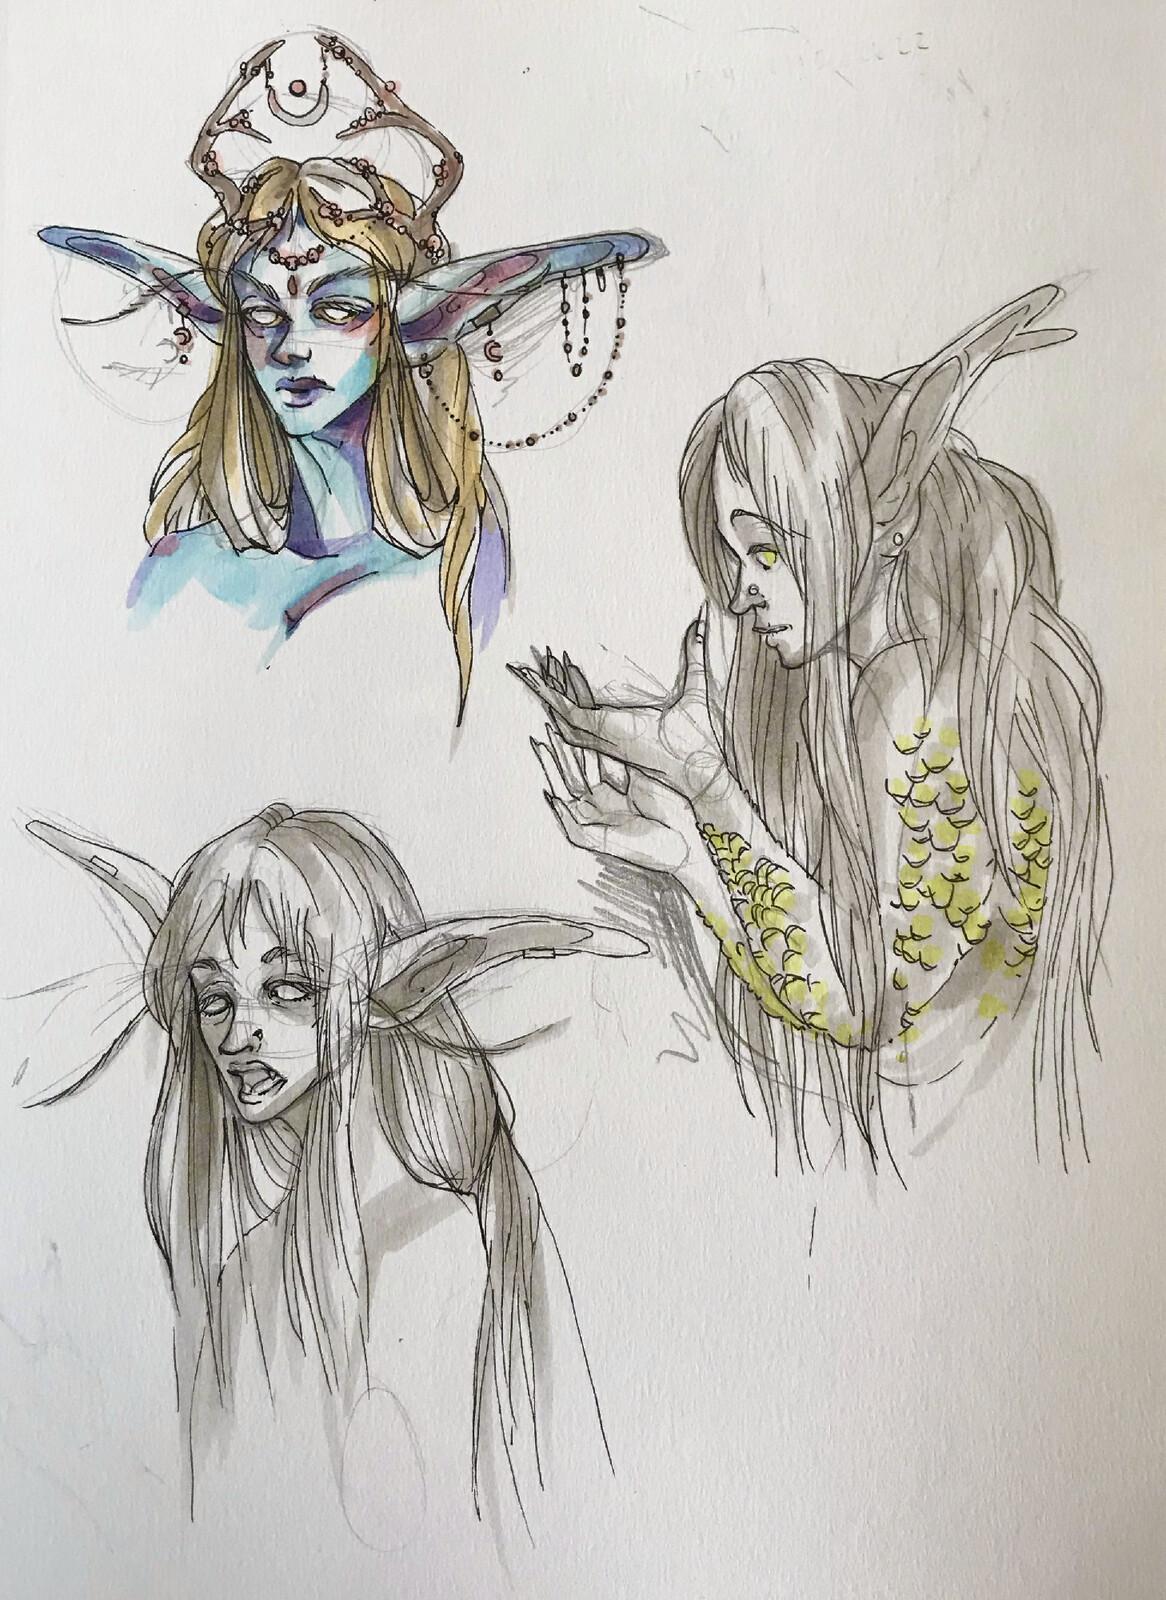 pretty elf fish girl :D!